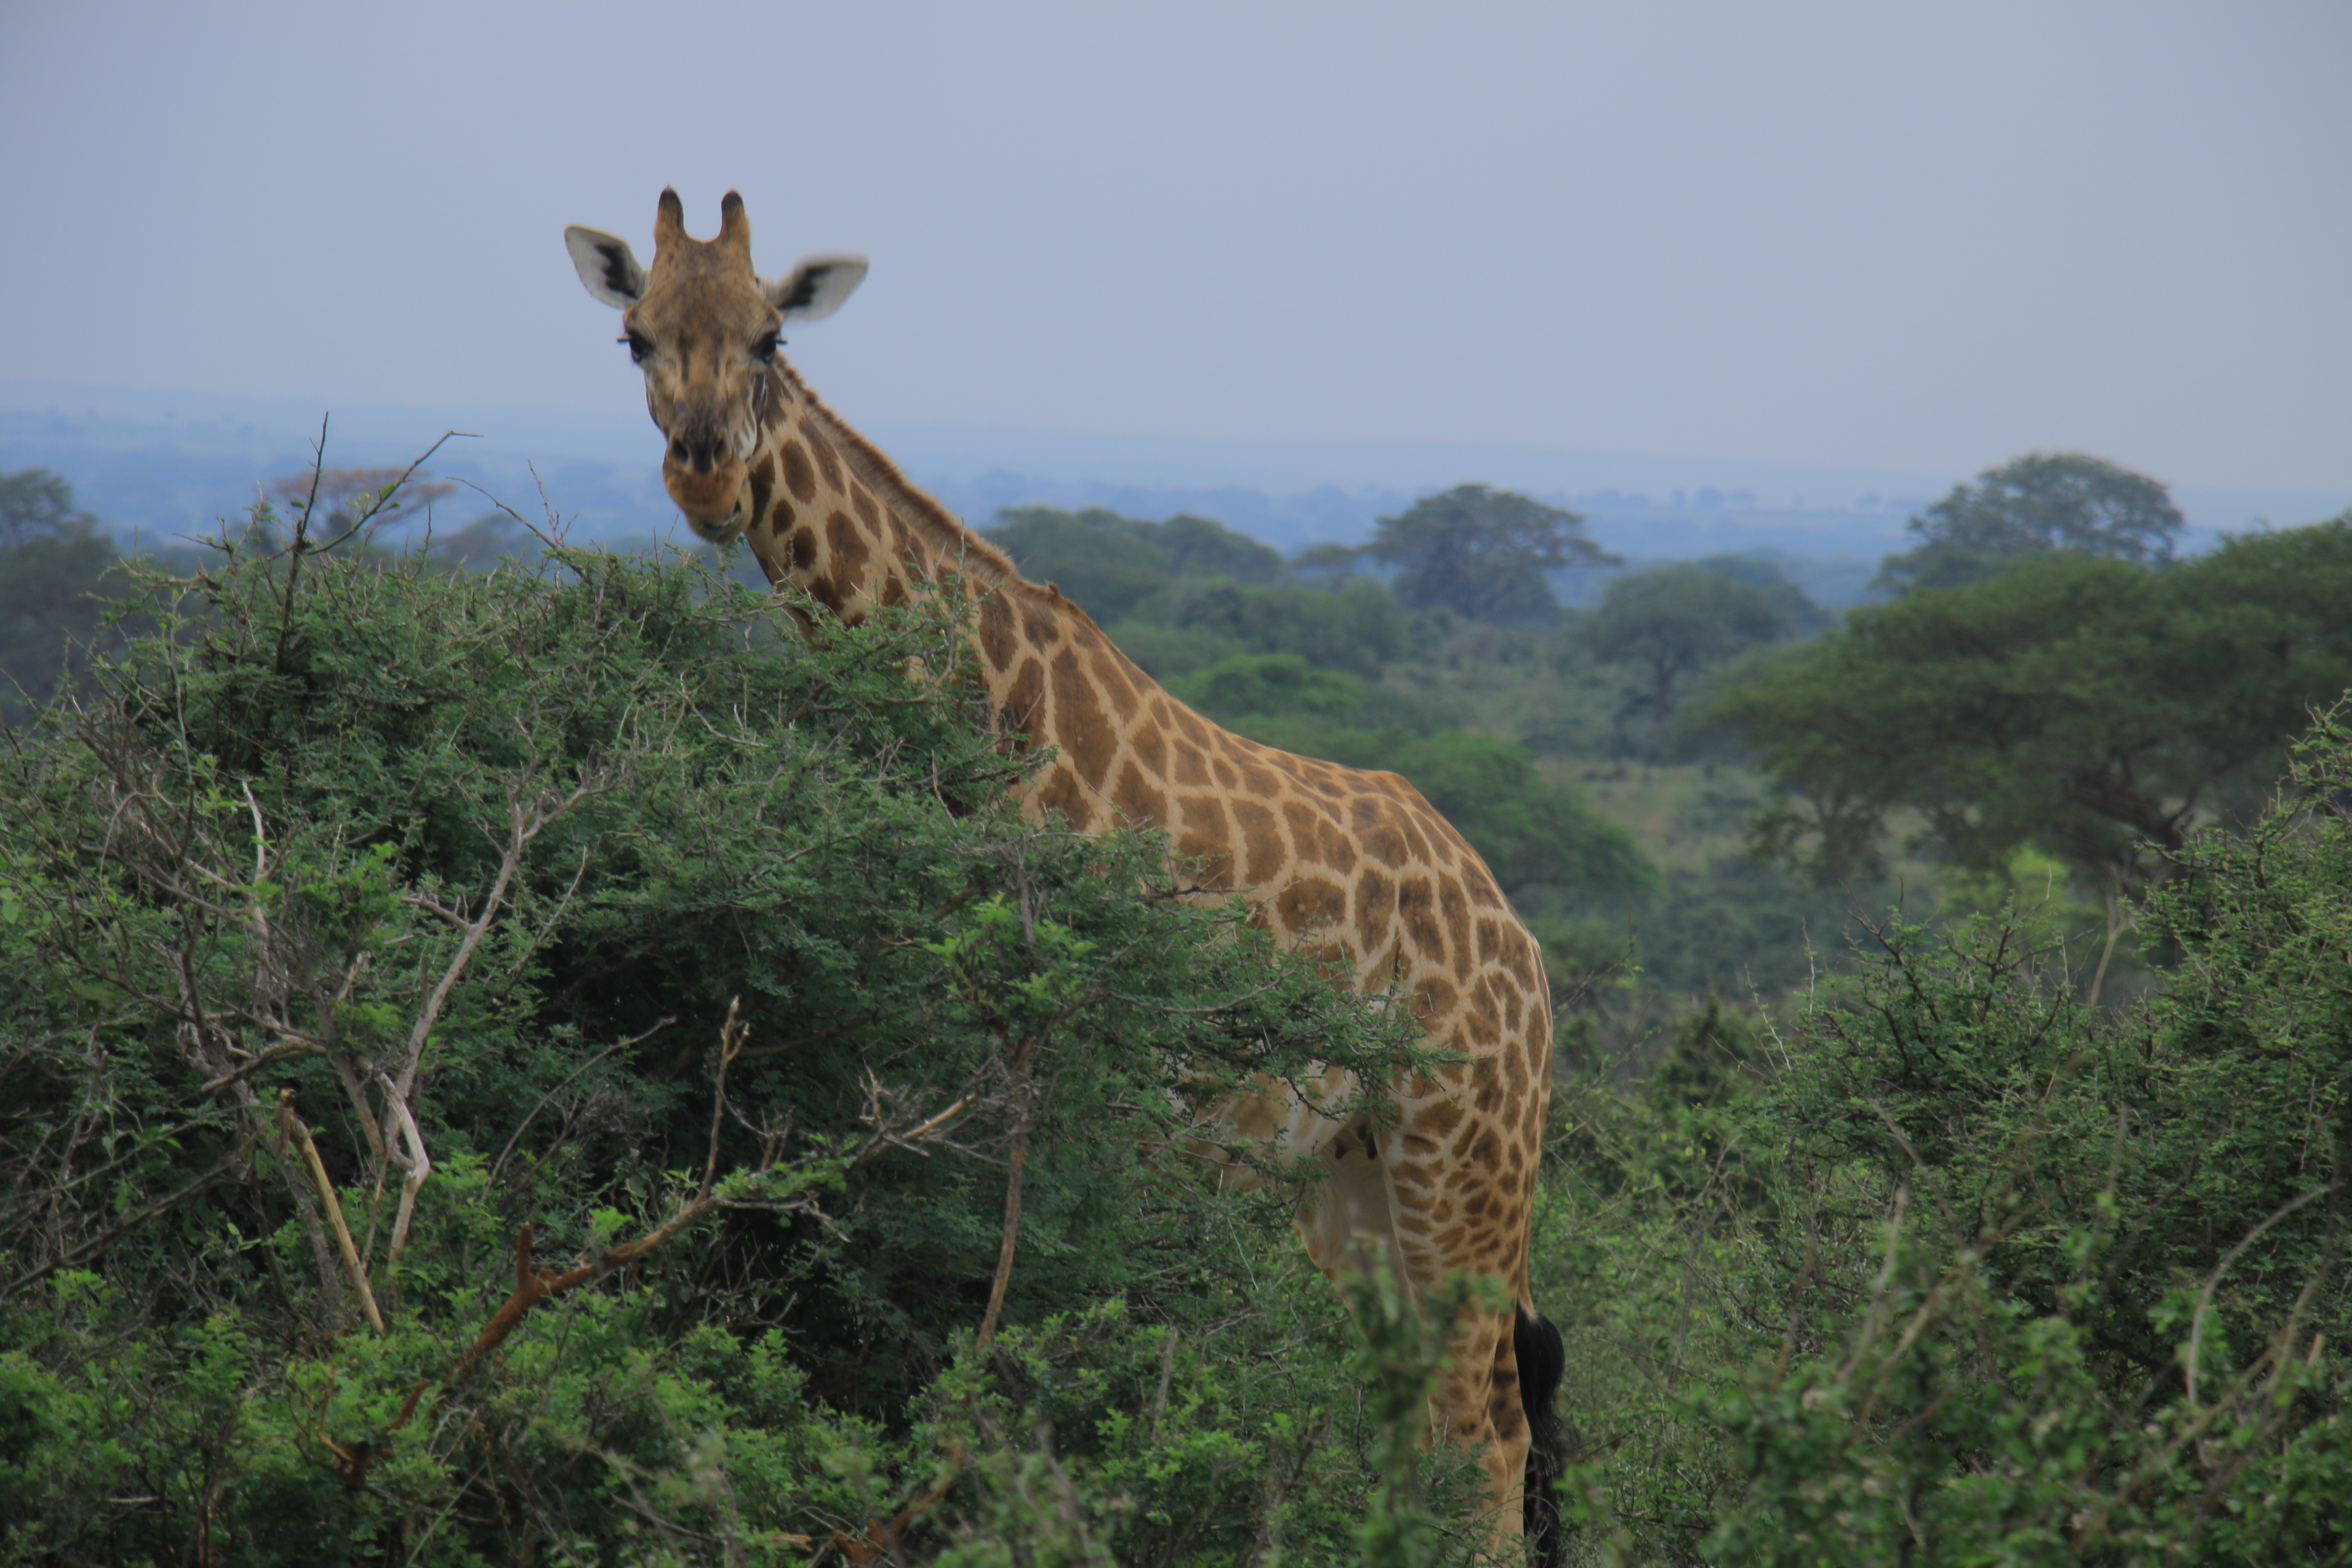 Uganda Primates, Wildlife & Kigali (Rwanda) City Tour 3